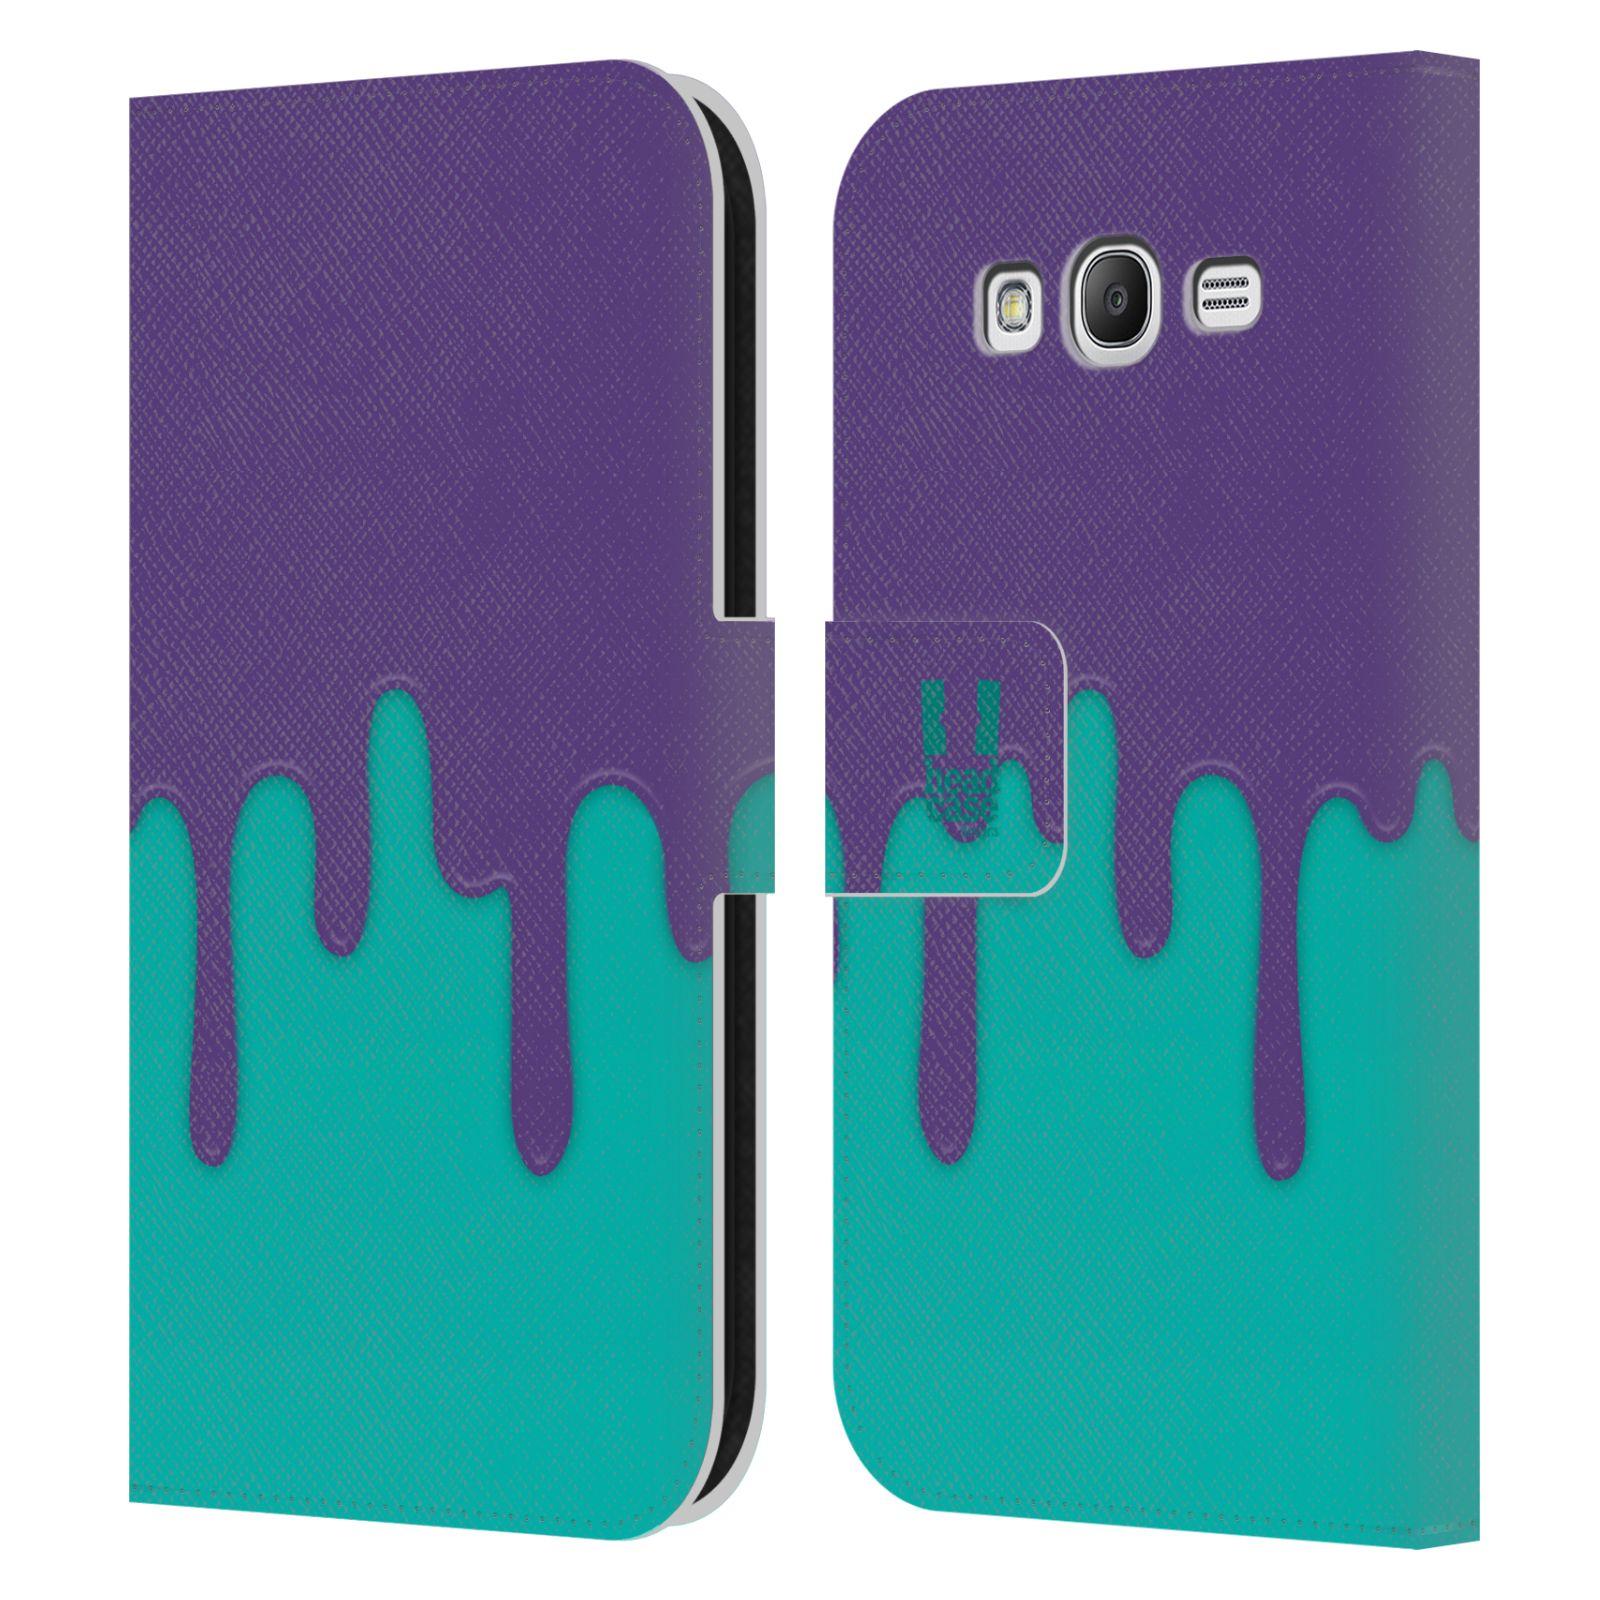 HEAD CASE Flipové pouzdro pro mobil Samsung Galaxy Grand i9080 Rozlitá barva fialová a tyrkysová